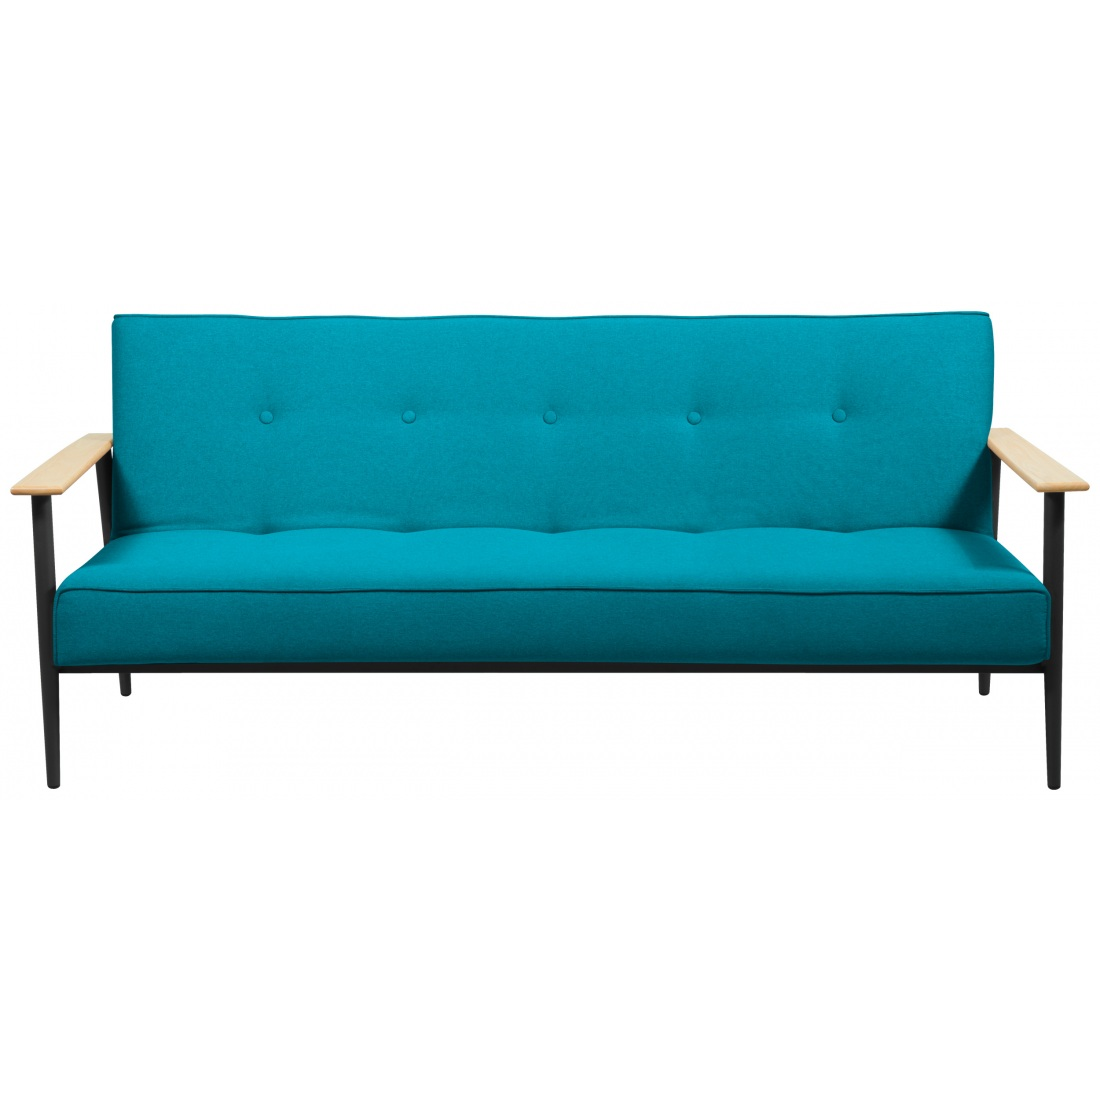 schlafsofa t rkis designer schlafcouch bettsofa g stebett. Black Bedroom Furniture Sets. Home Design Ideas